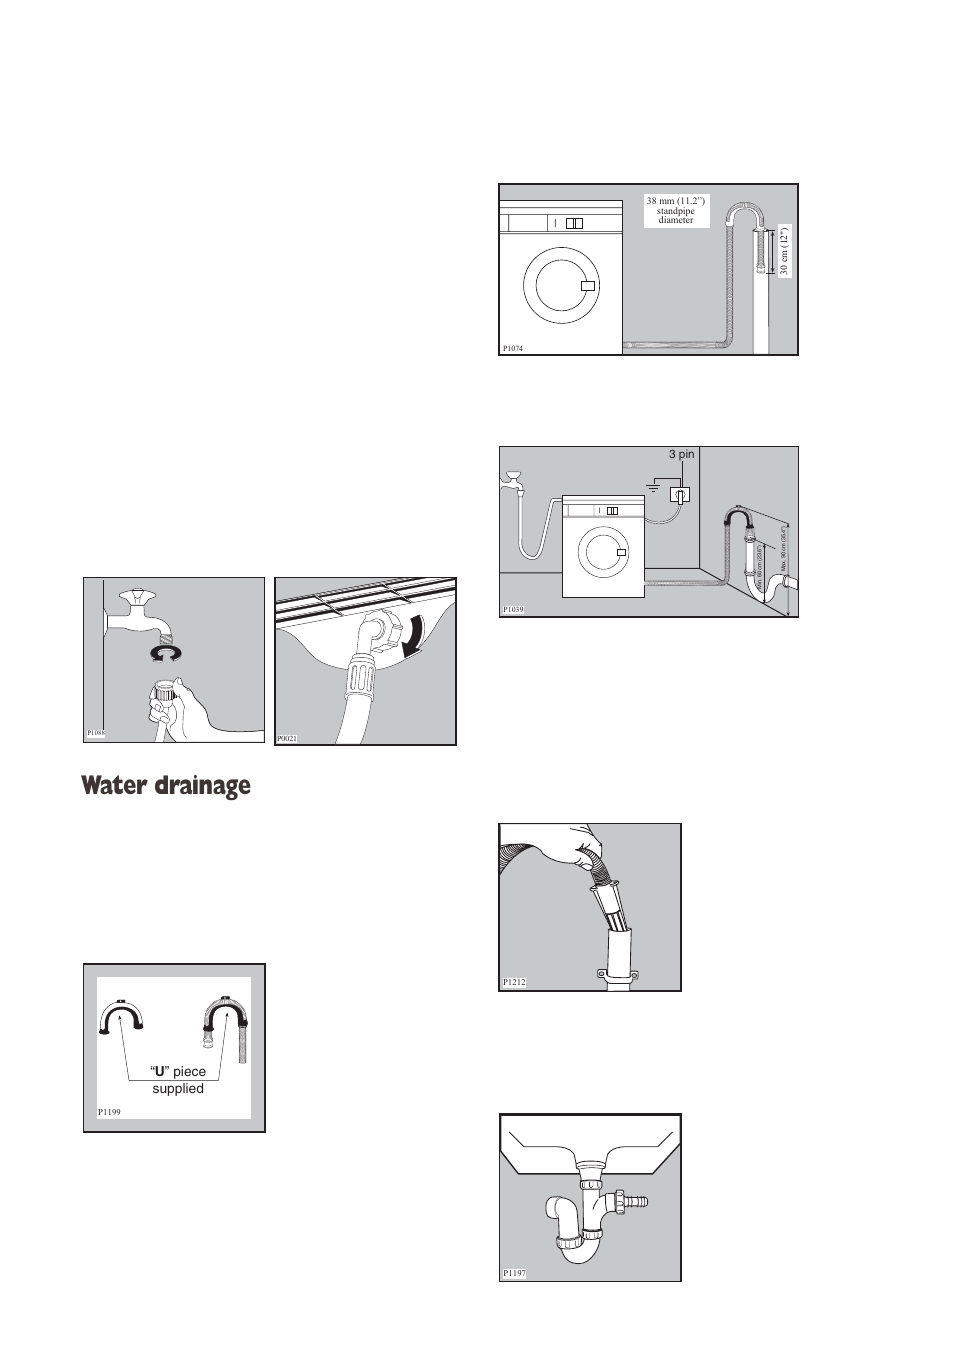 water drainage electrolux aqualux ewd 1214 i user manual page 25 rh manualsdir com User Manual PDF User Manual Template